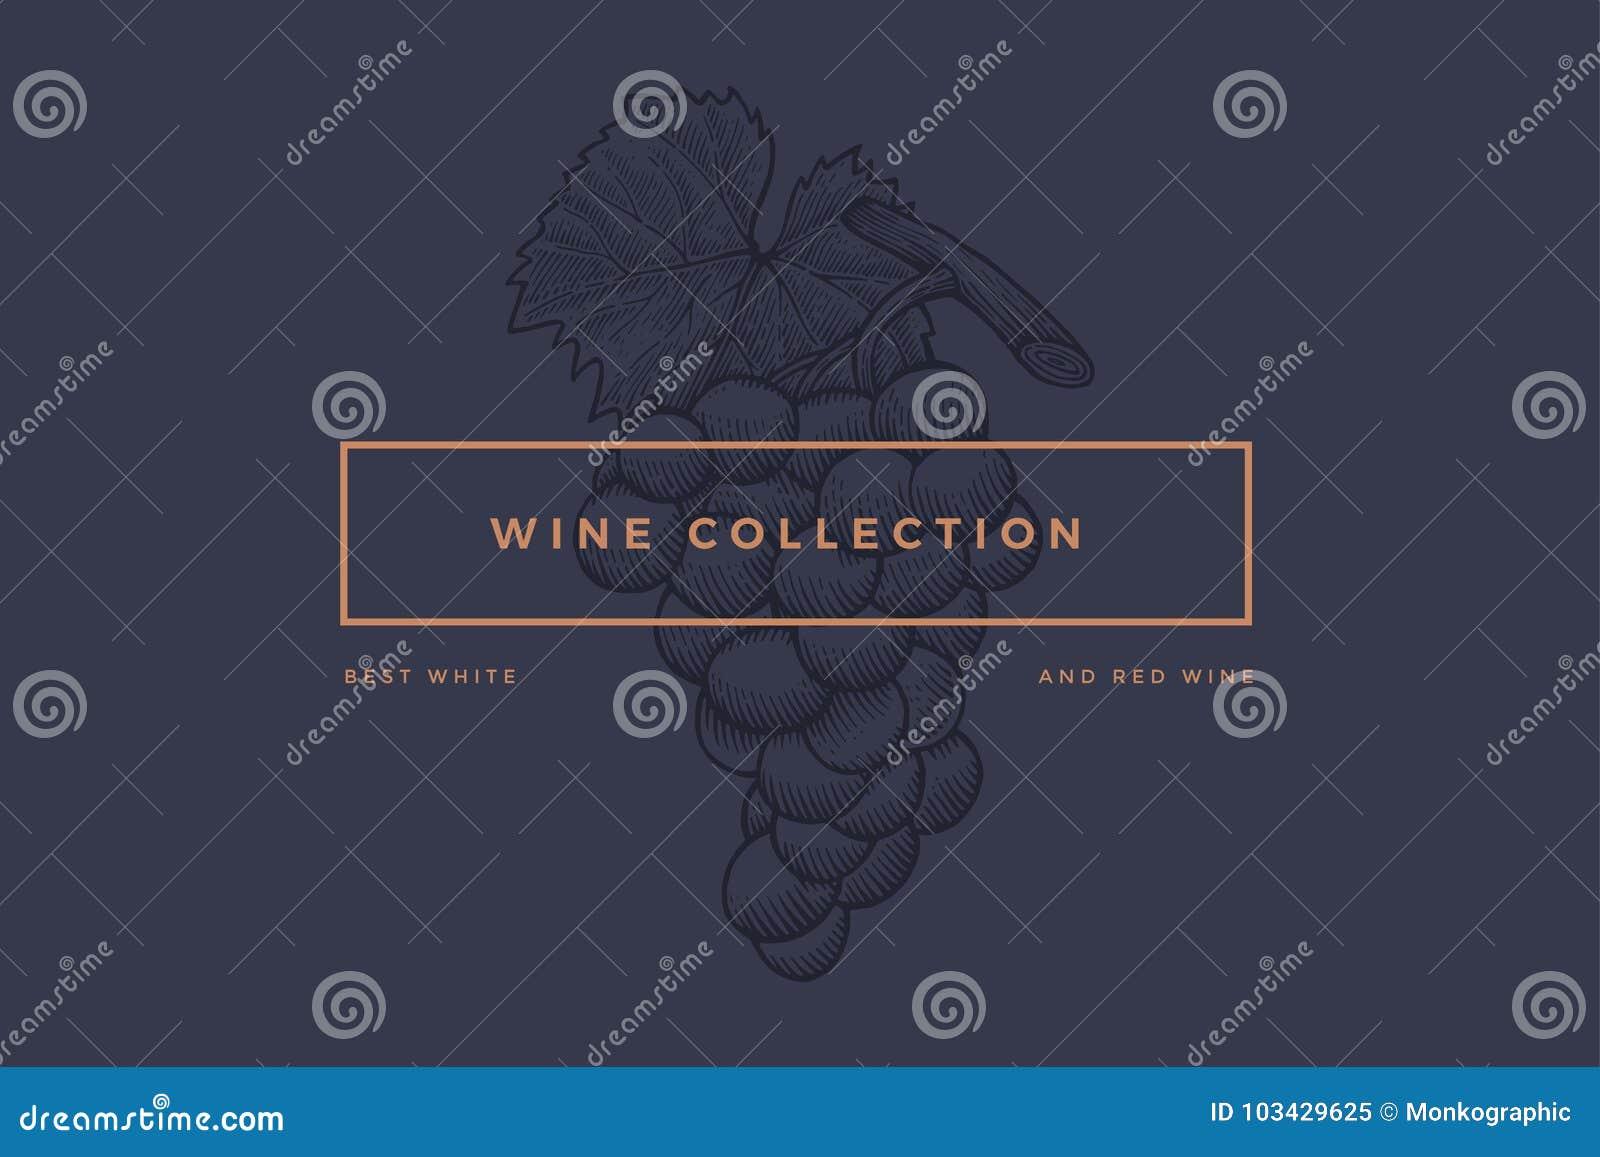 logo template for design of wine card booklet menu for restaurant